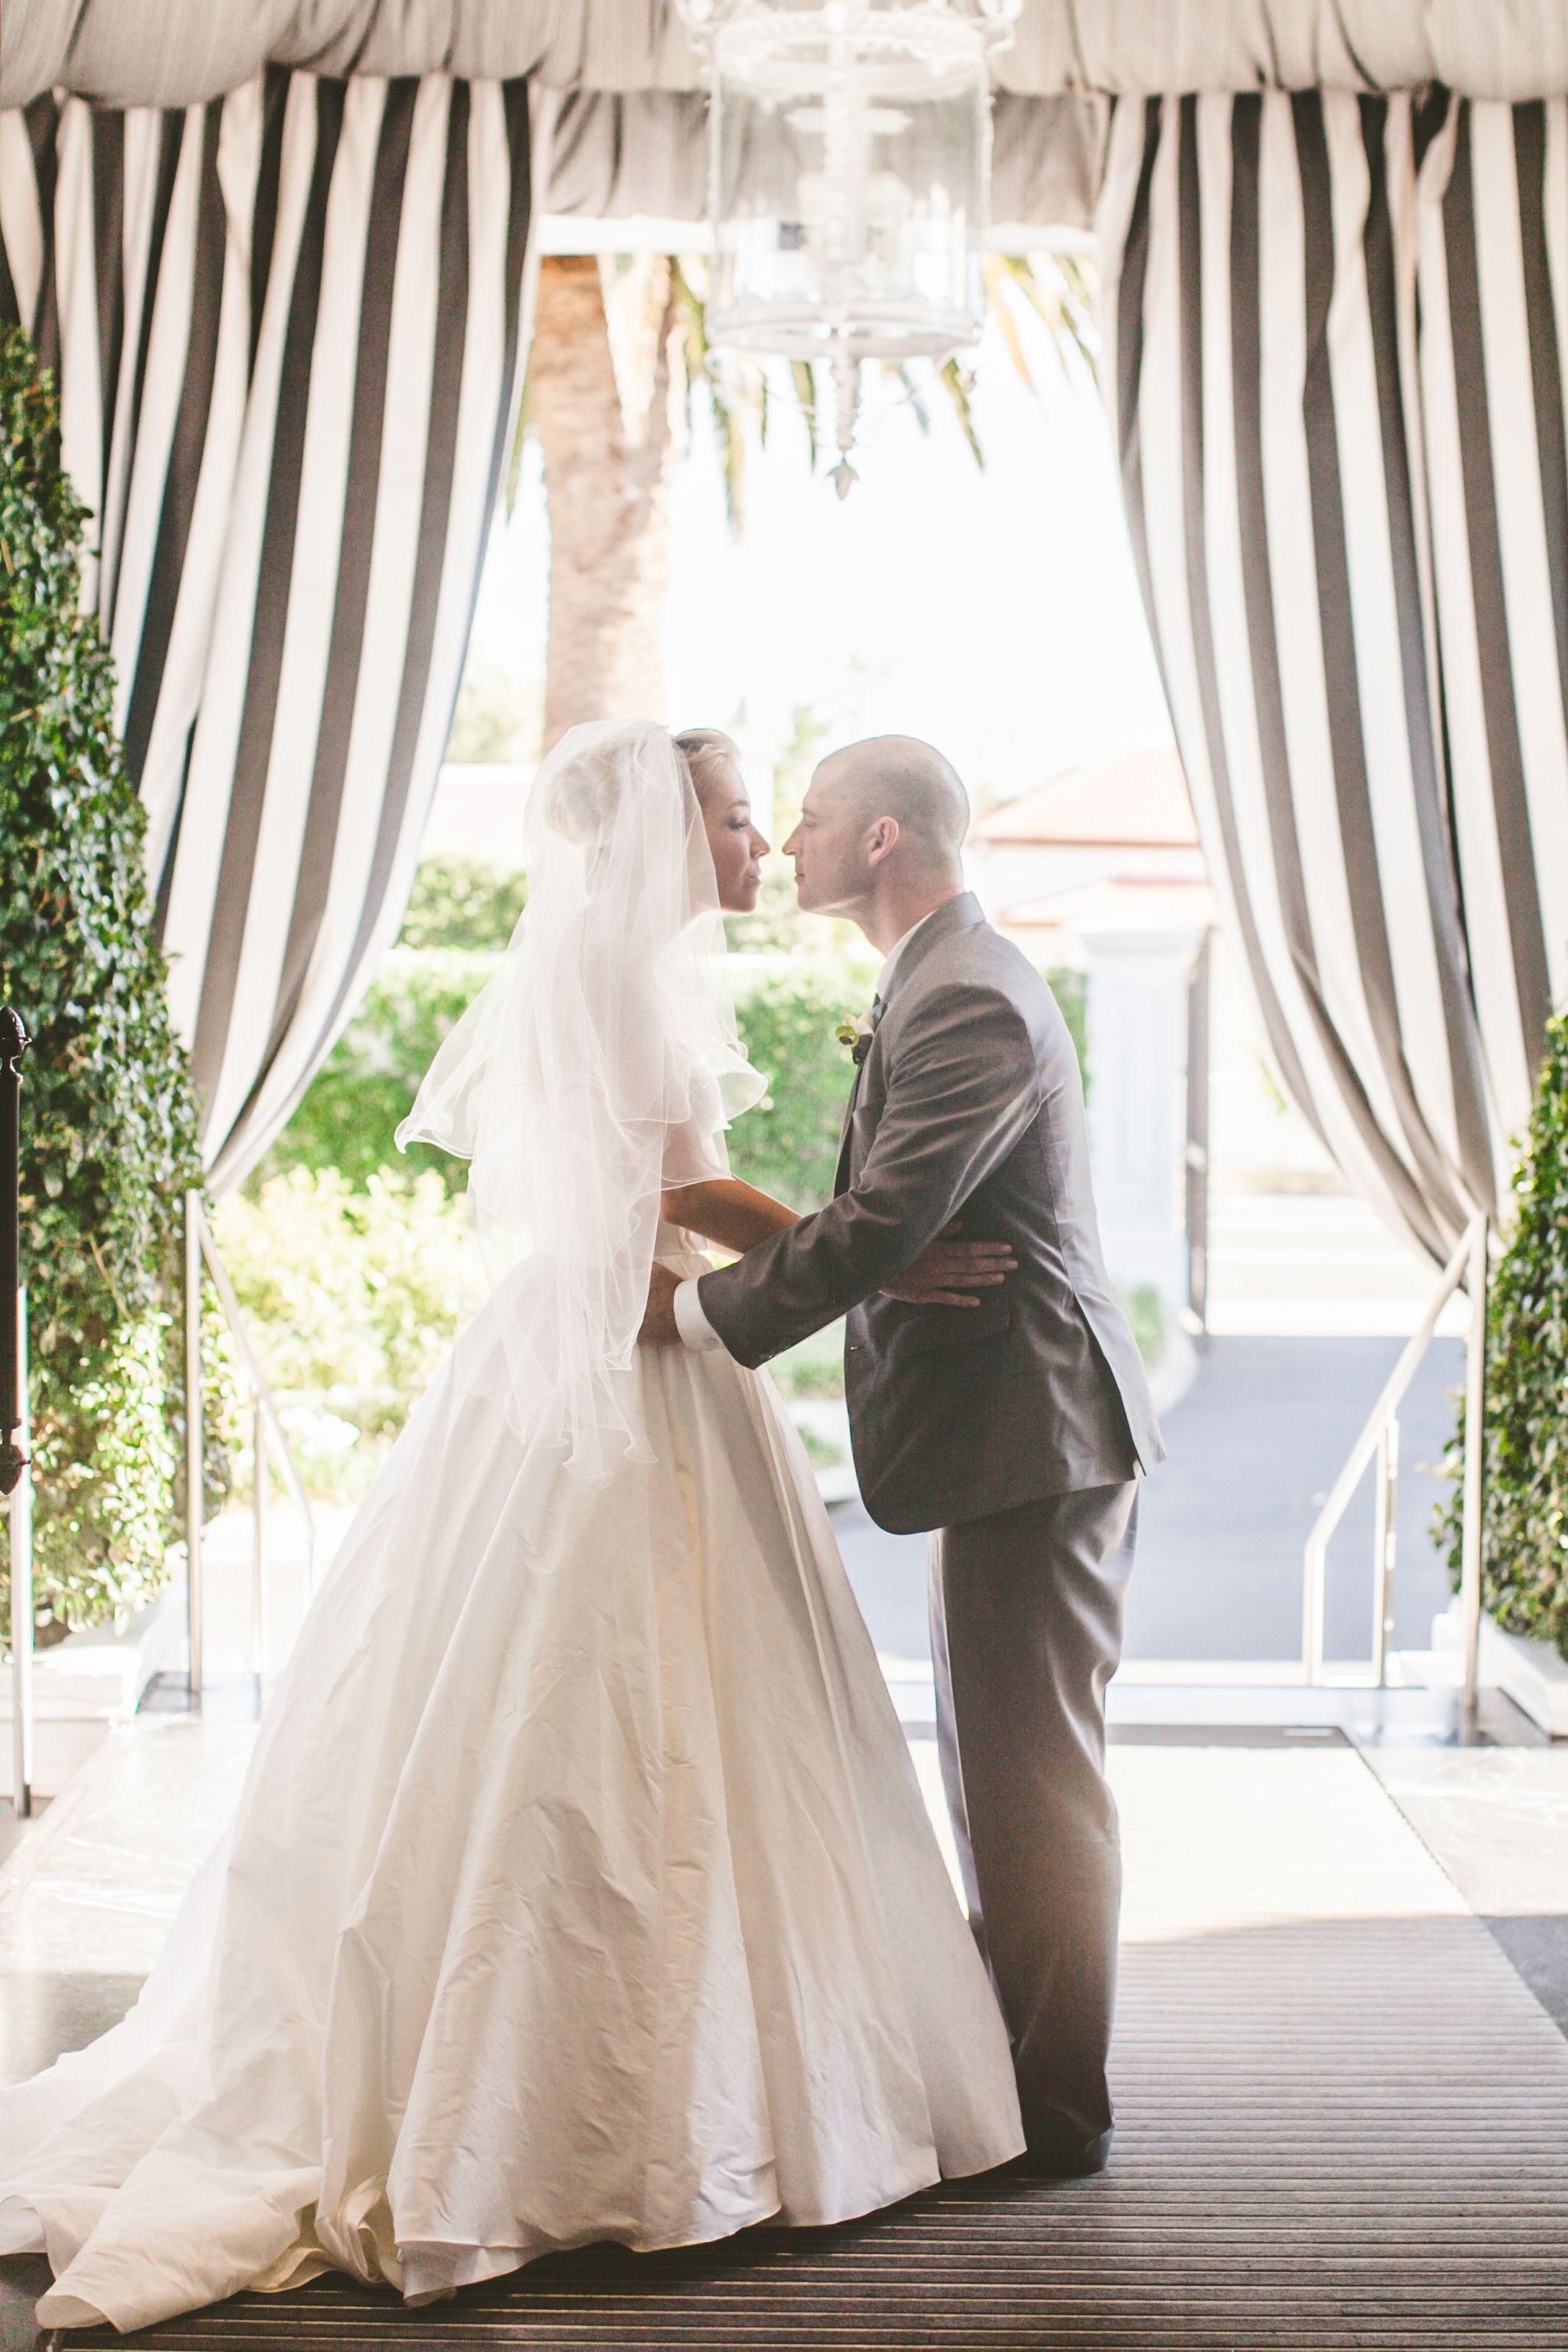 Australian Wedding Gifts For Overseas: Brighton International Australia